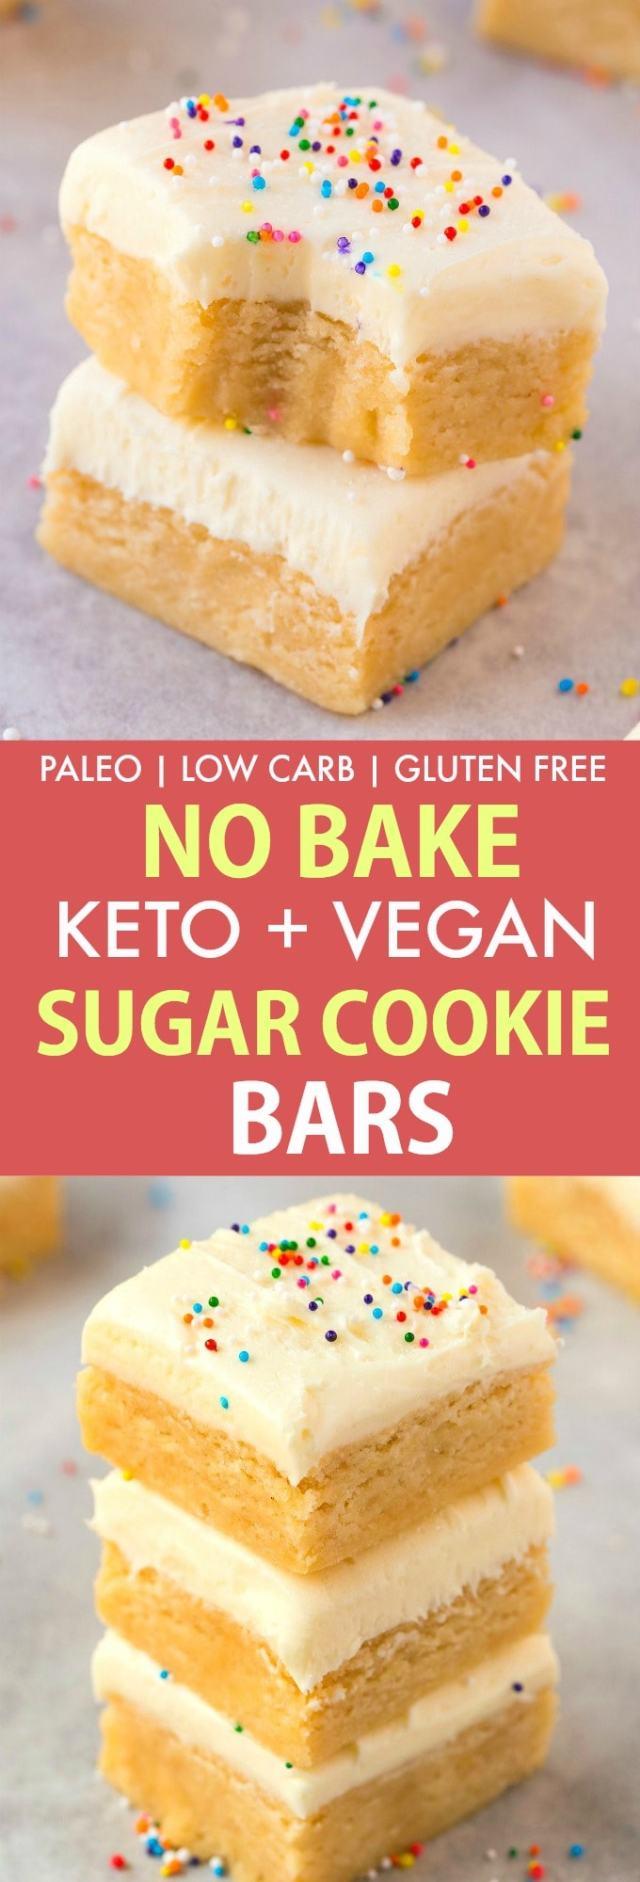 Healthy No Bake Paleo Vegan Sugar Cookie Bars